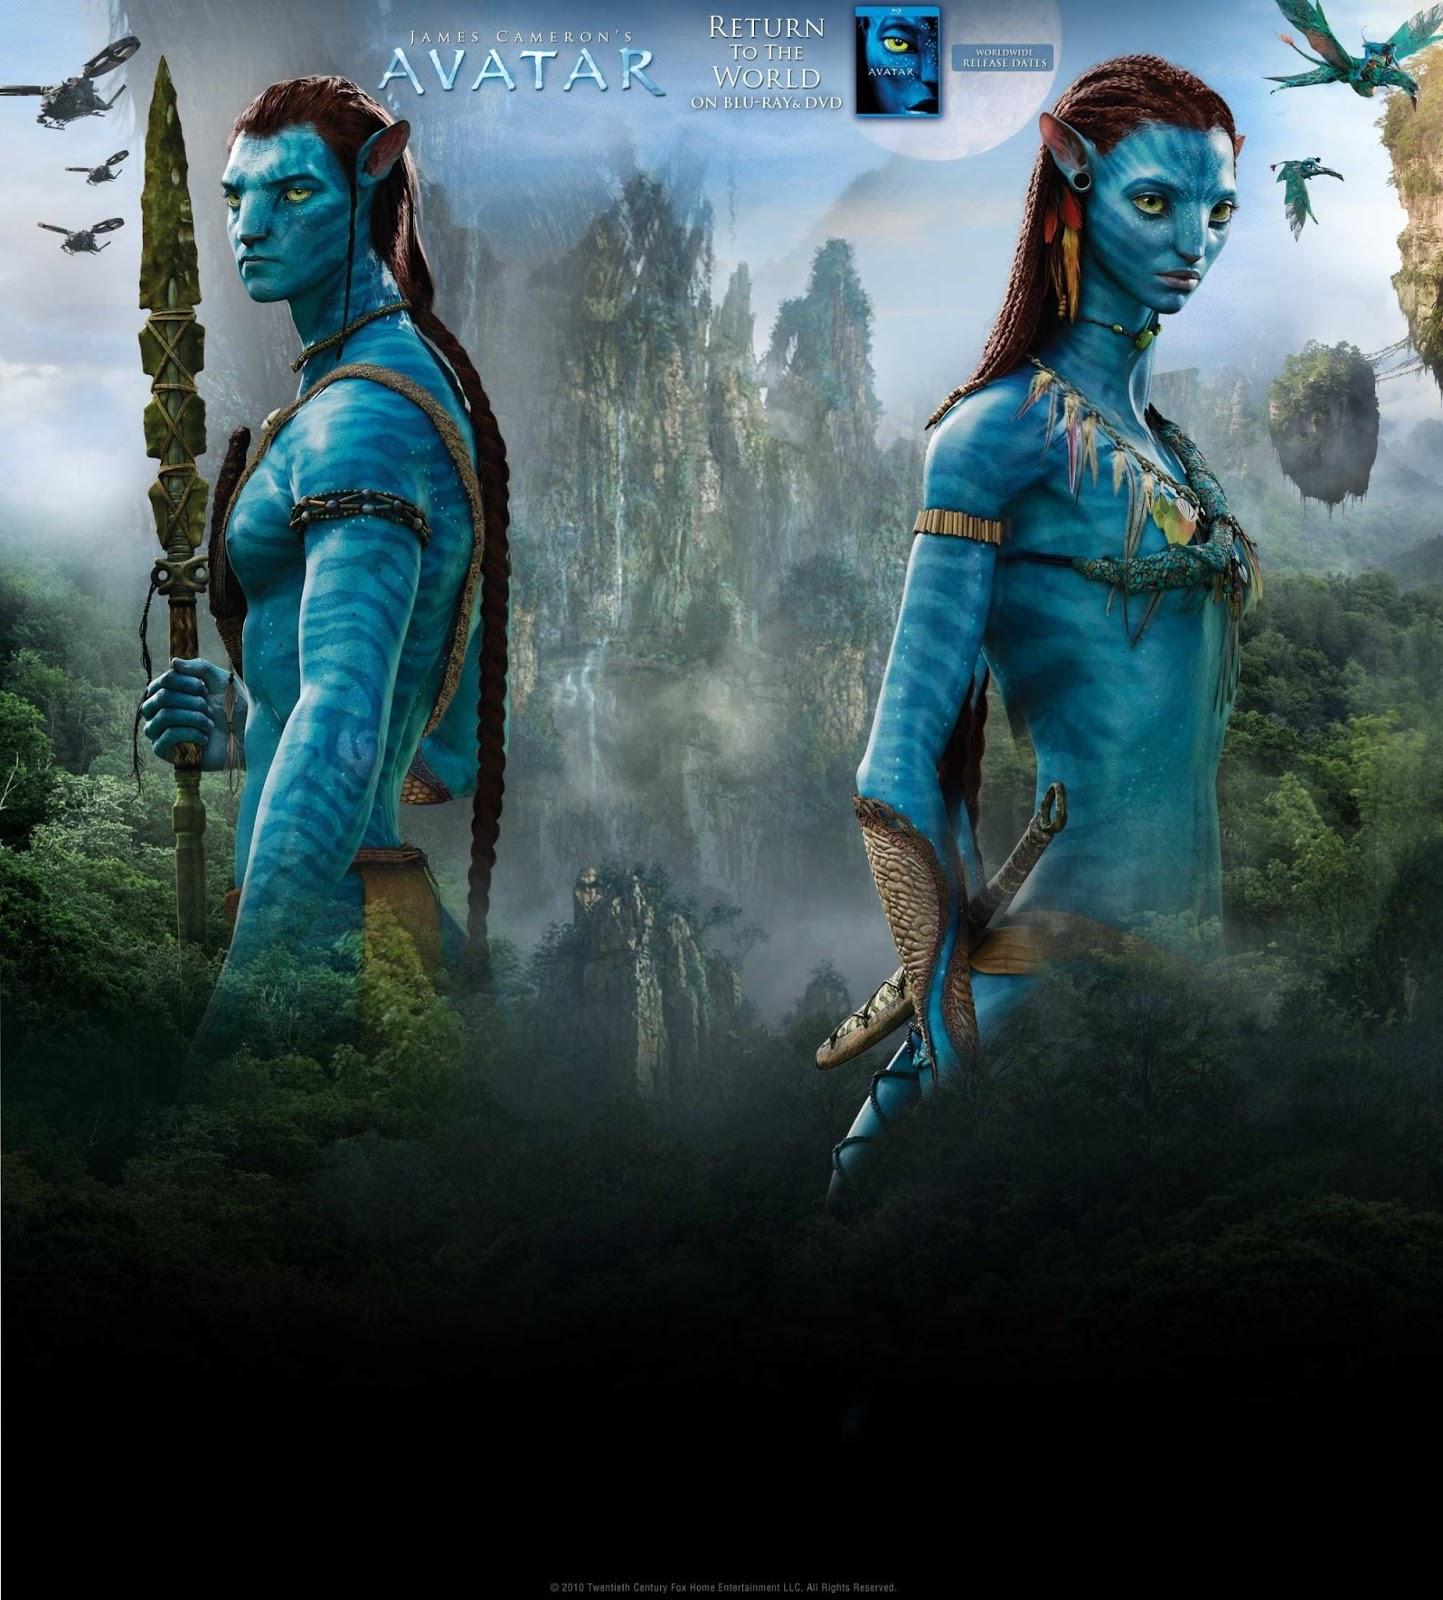 Avatar Sequel Cast: Só Torrents Softwares Games Filmes: Avatar Filme Completo